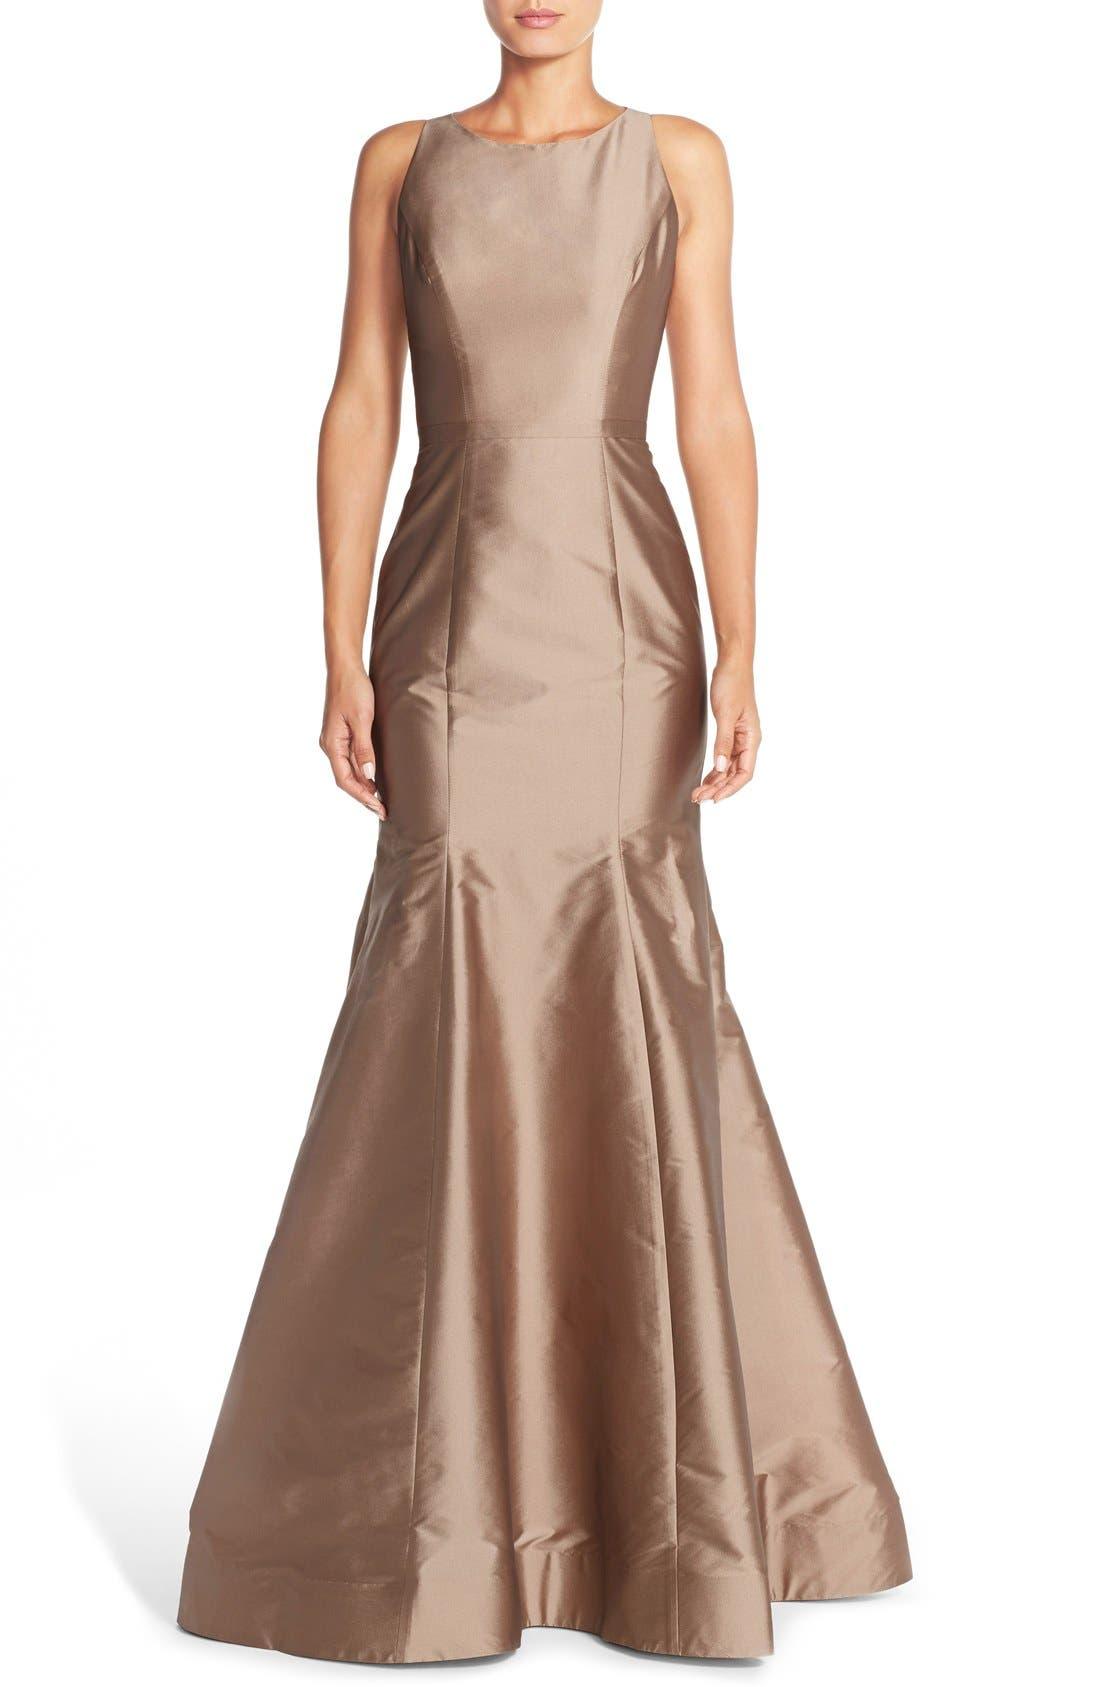 Main Image - Monique Lhuillier Bridesmaids Back Cutout Taffeta Mermaid Gown